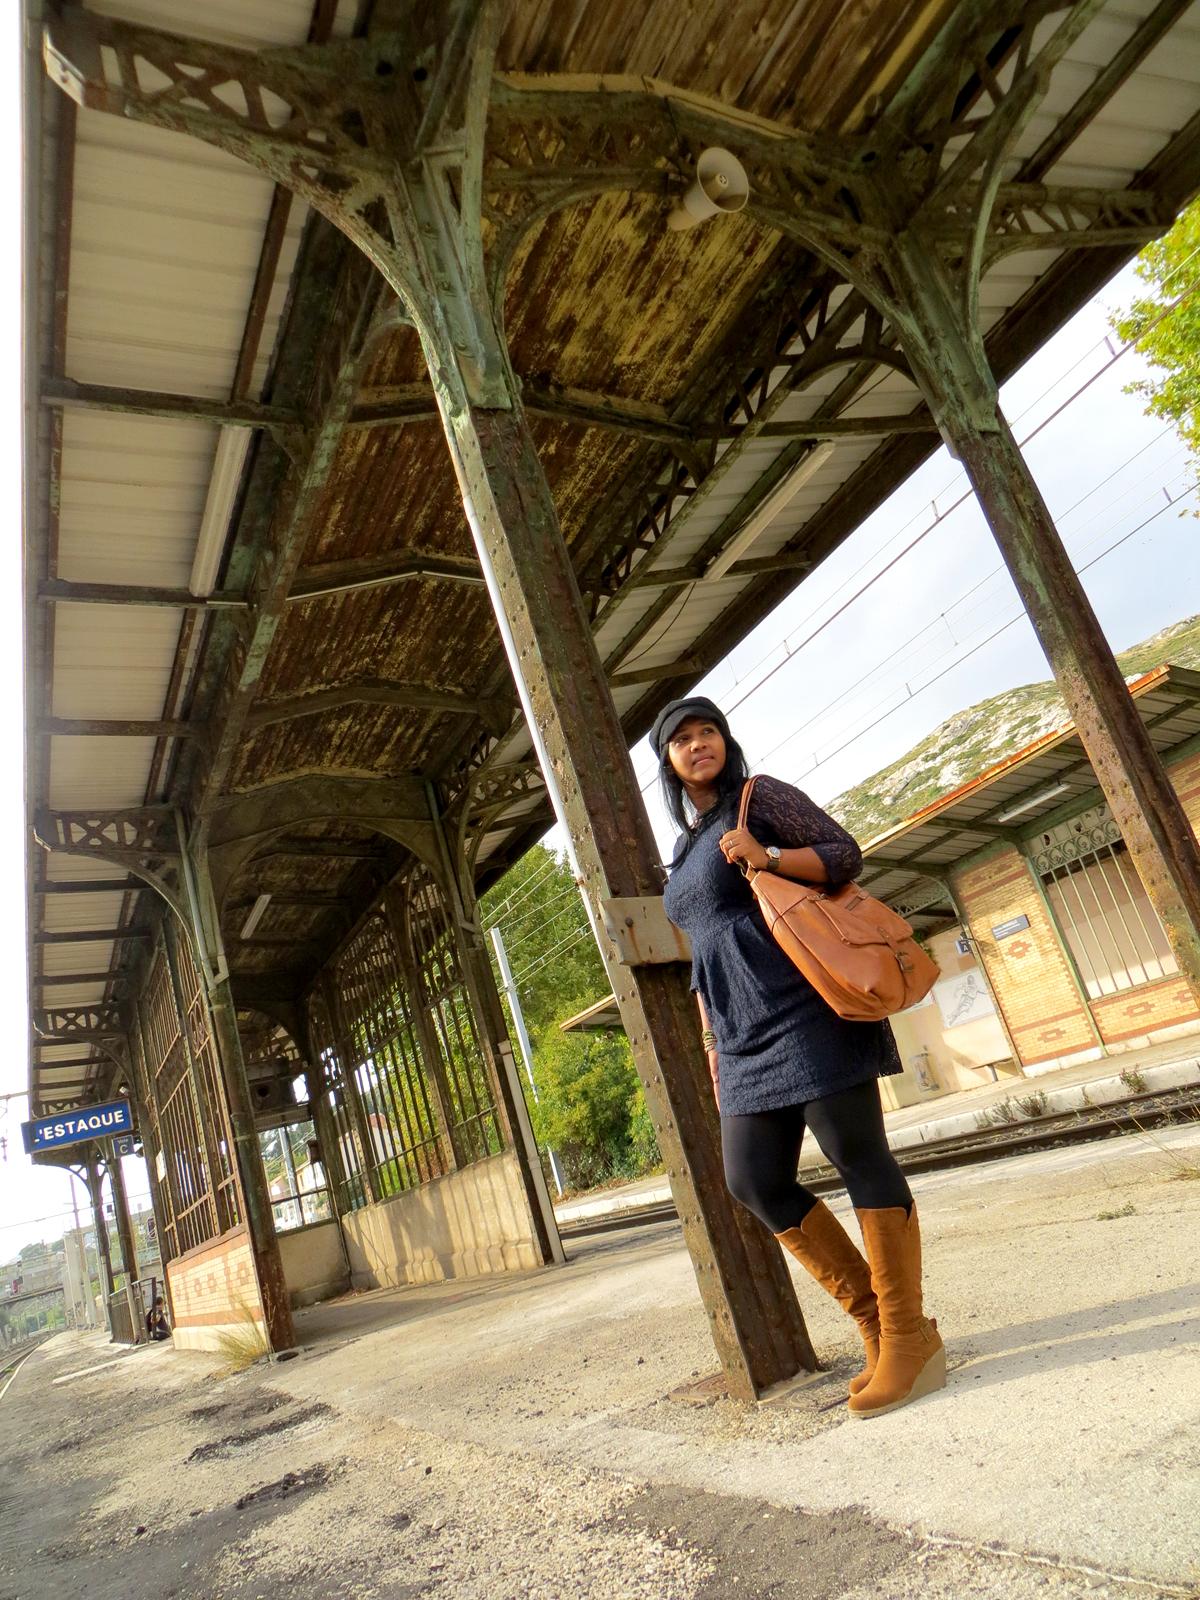 Hema_Waiting_for_the_train_C-Oui-Copenhague3